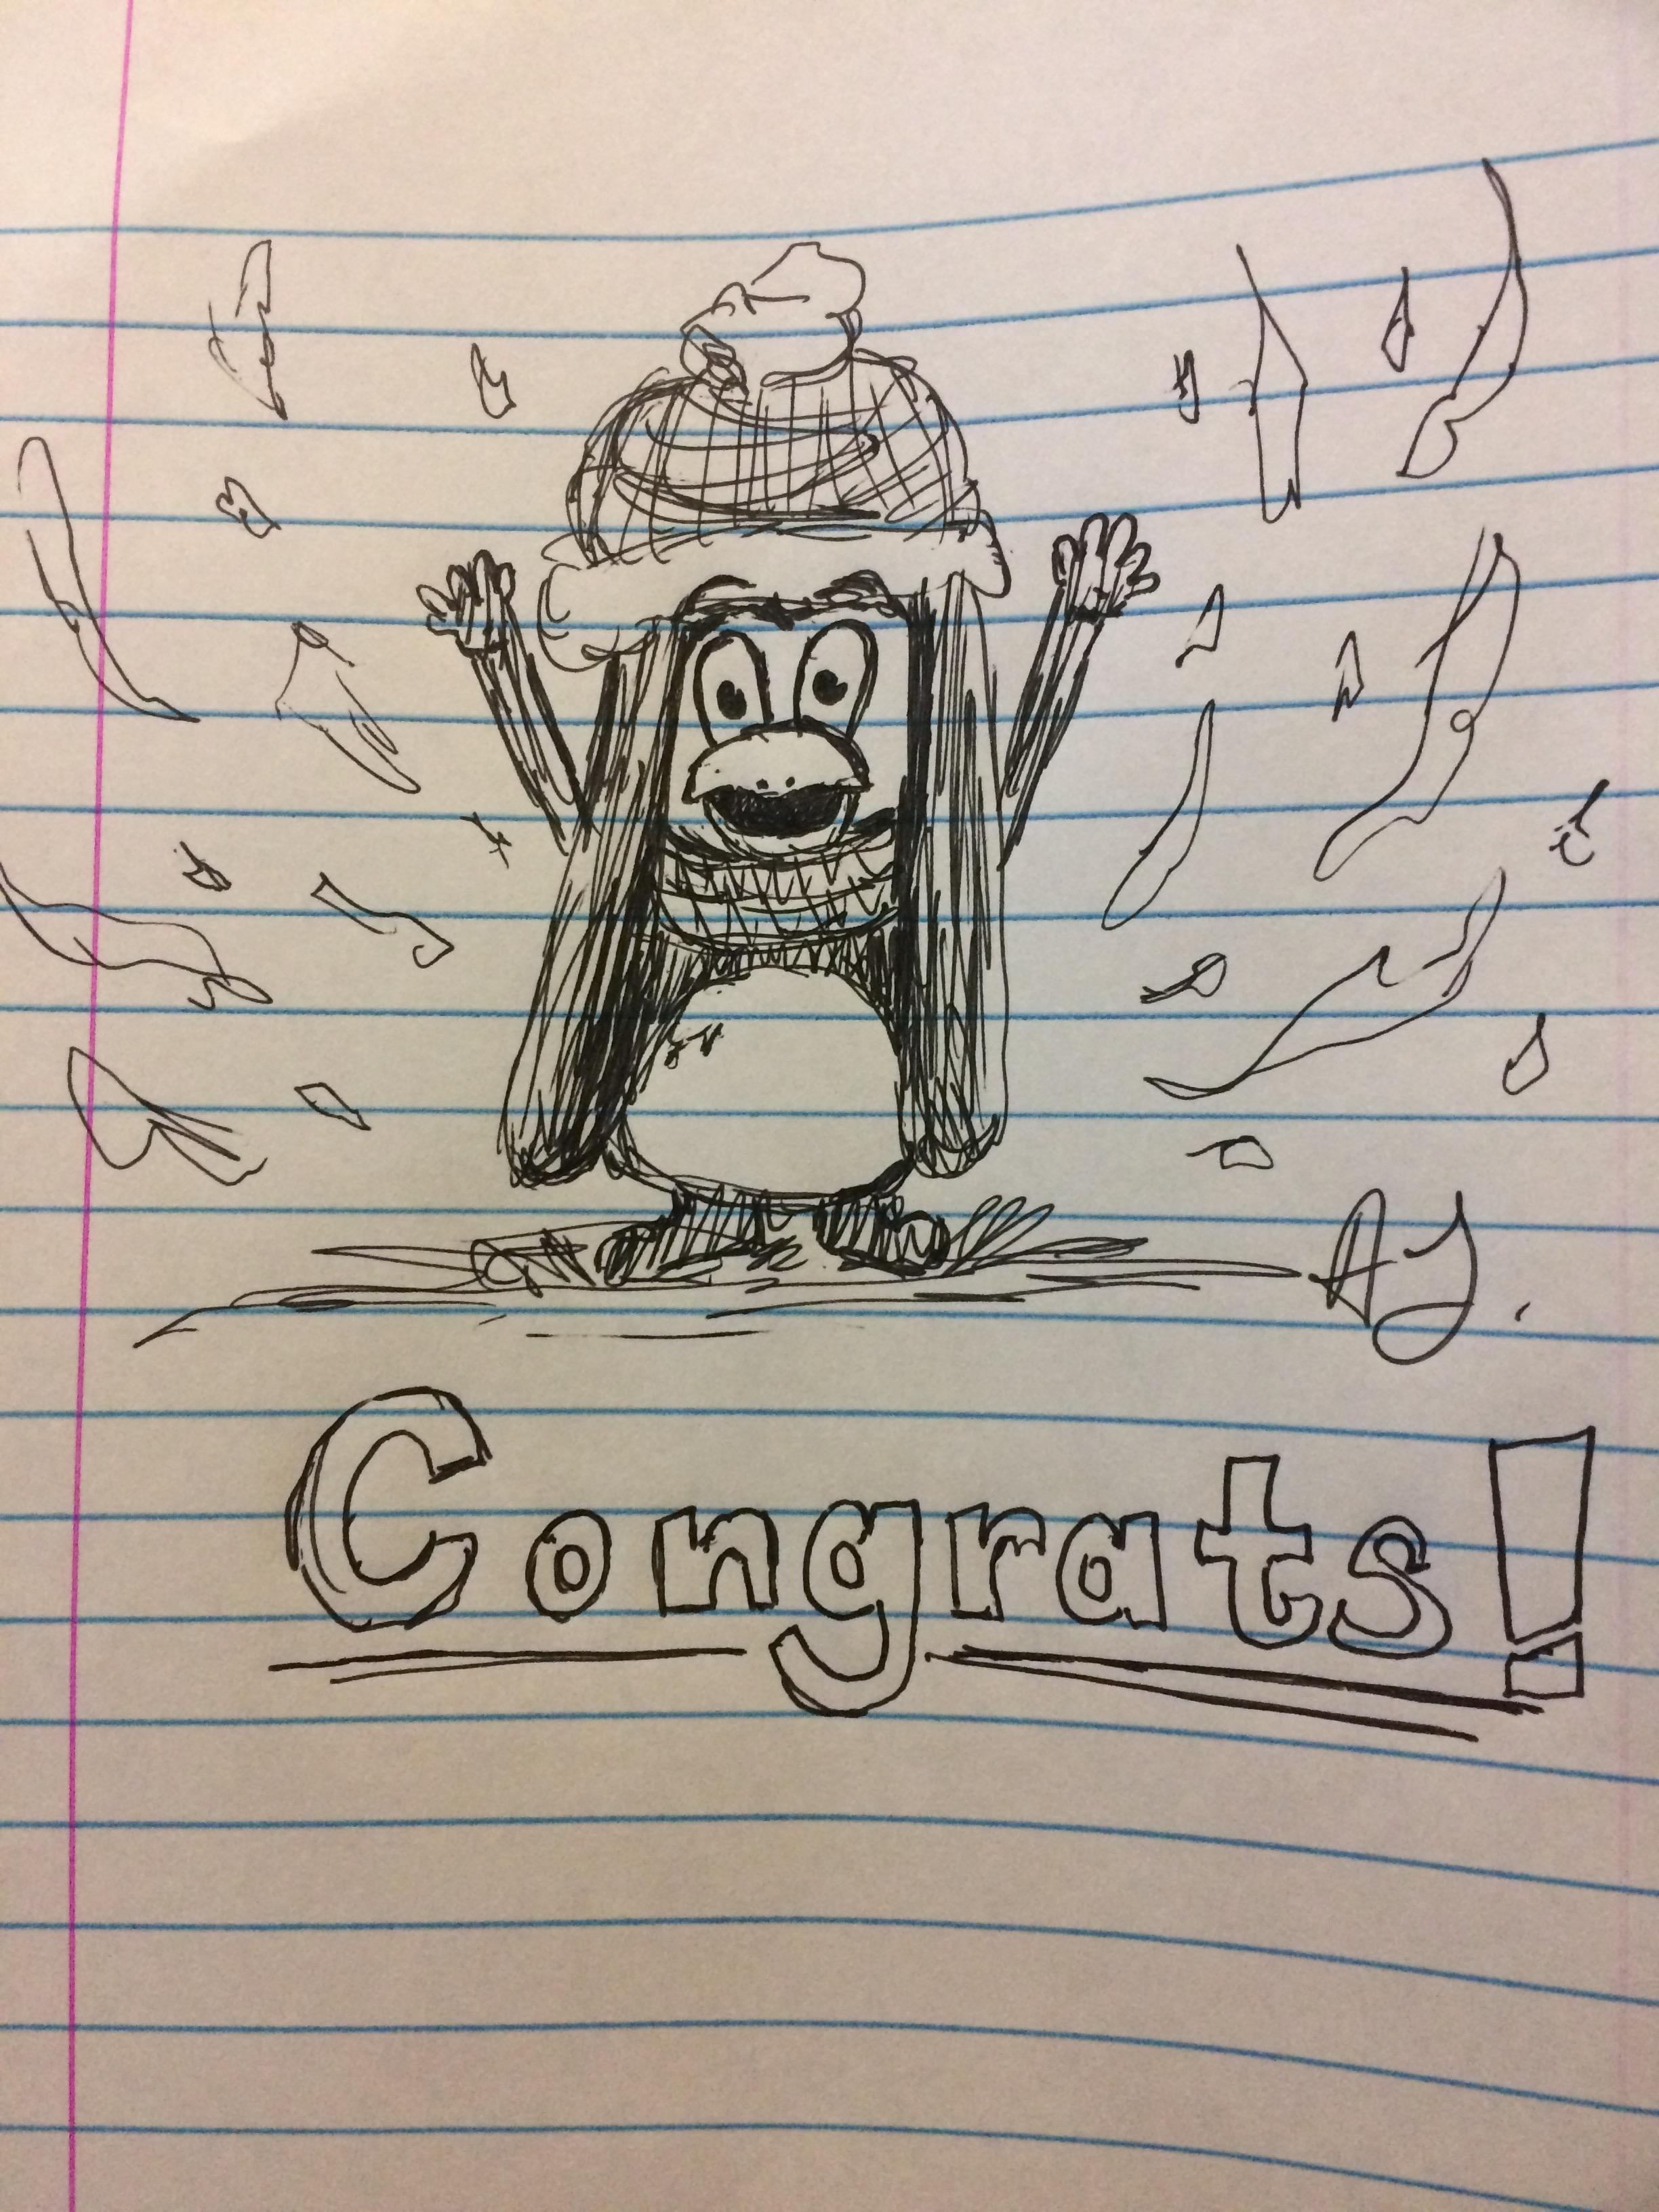 Congrats! Penguin